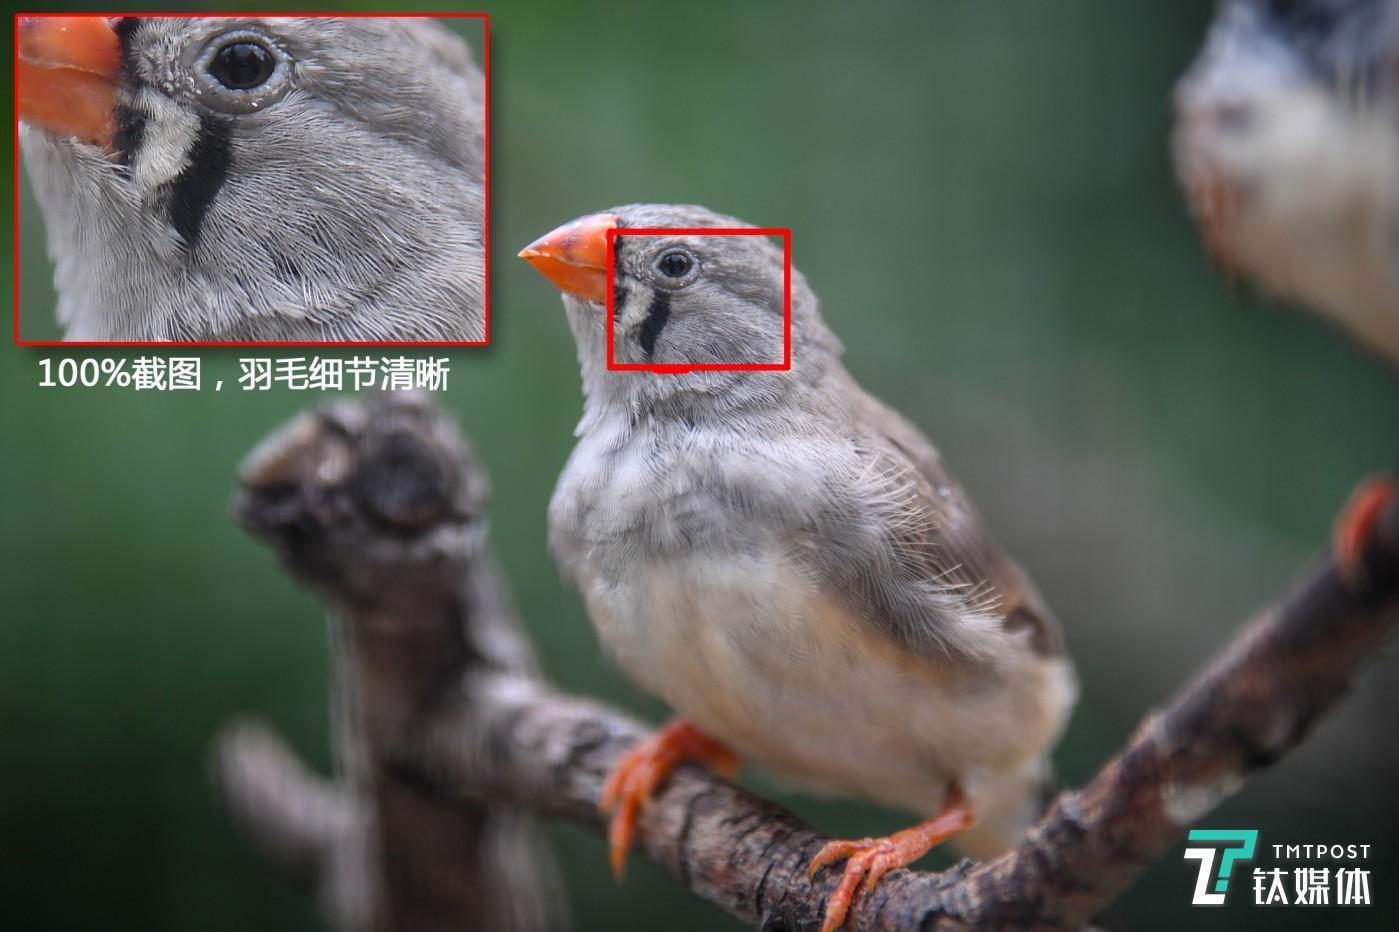 机身:佳能EOS 5DS 镜头:EF 70-200mm f/2.8L IS III USM 焦距:200mm 光圈:f/2.8 快门:1/160s ISO:1250